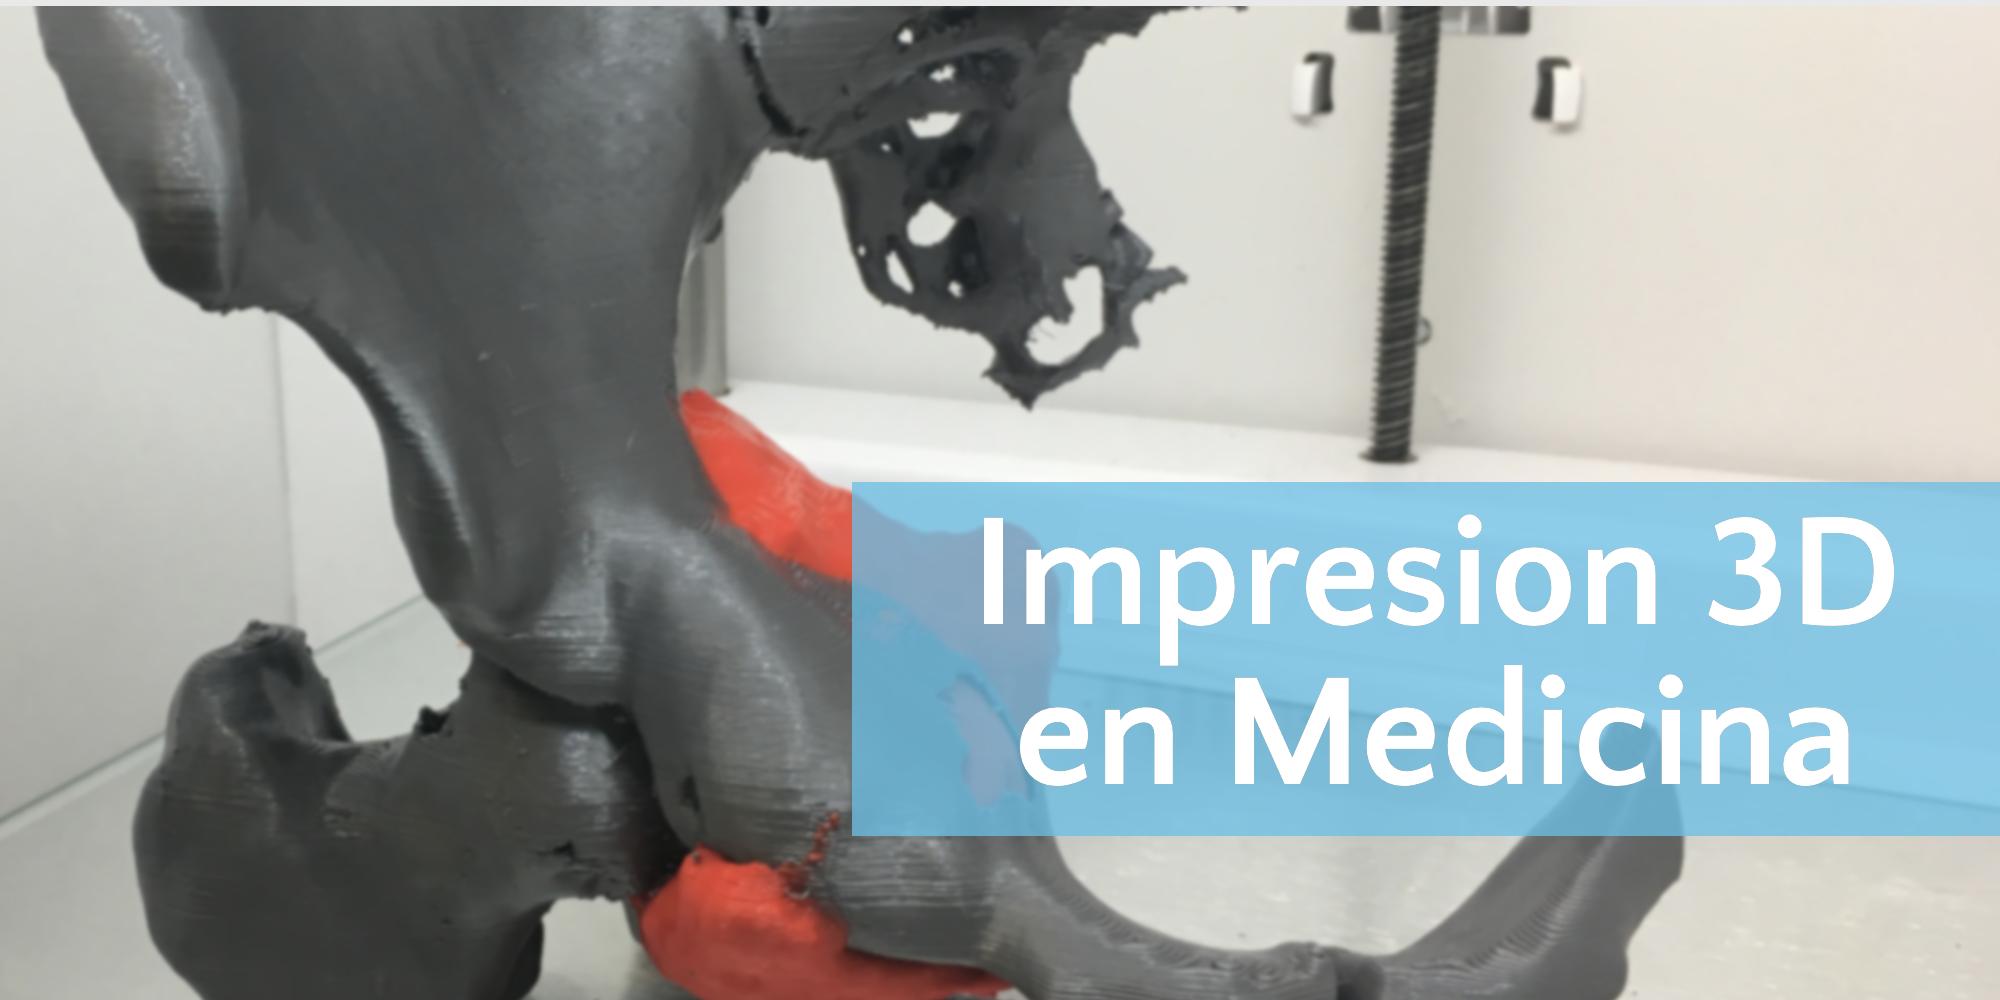 Impresión 3D en Medicina